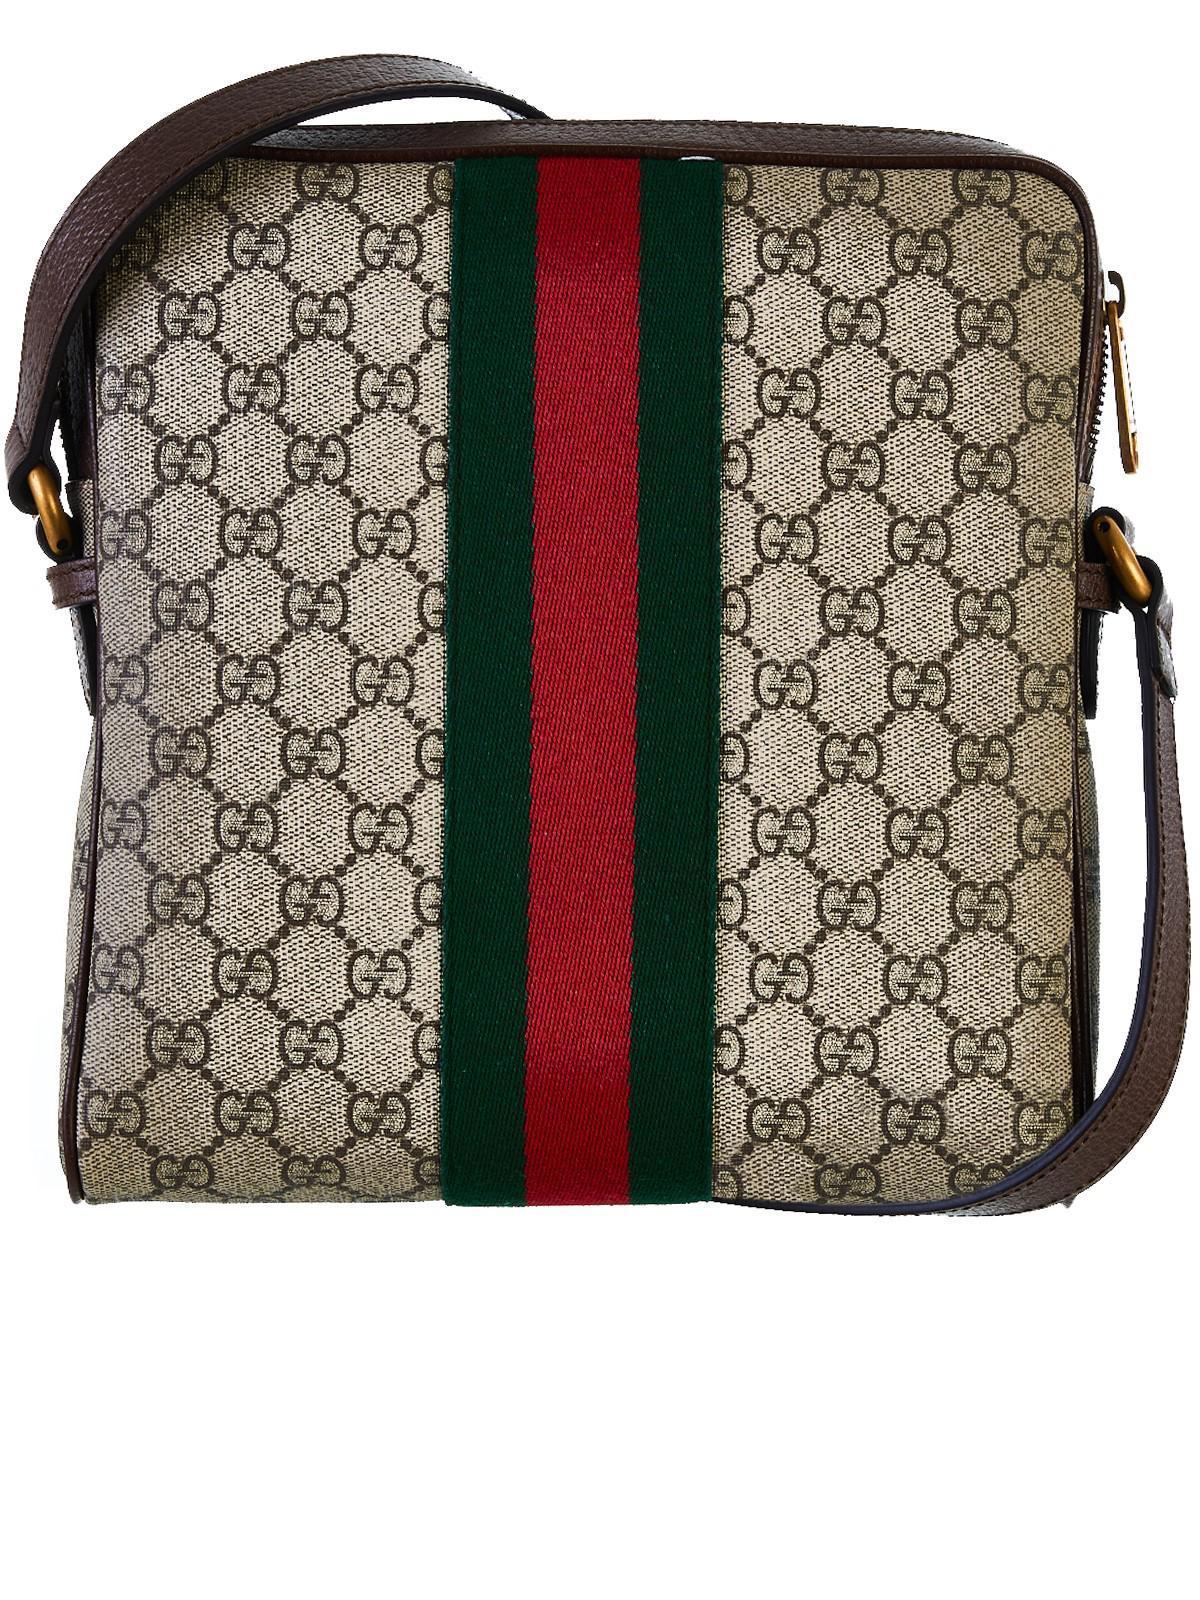 d43551dbb933 Gucci Web GG Supreme Messenger Bag - Lyst